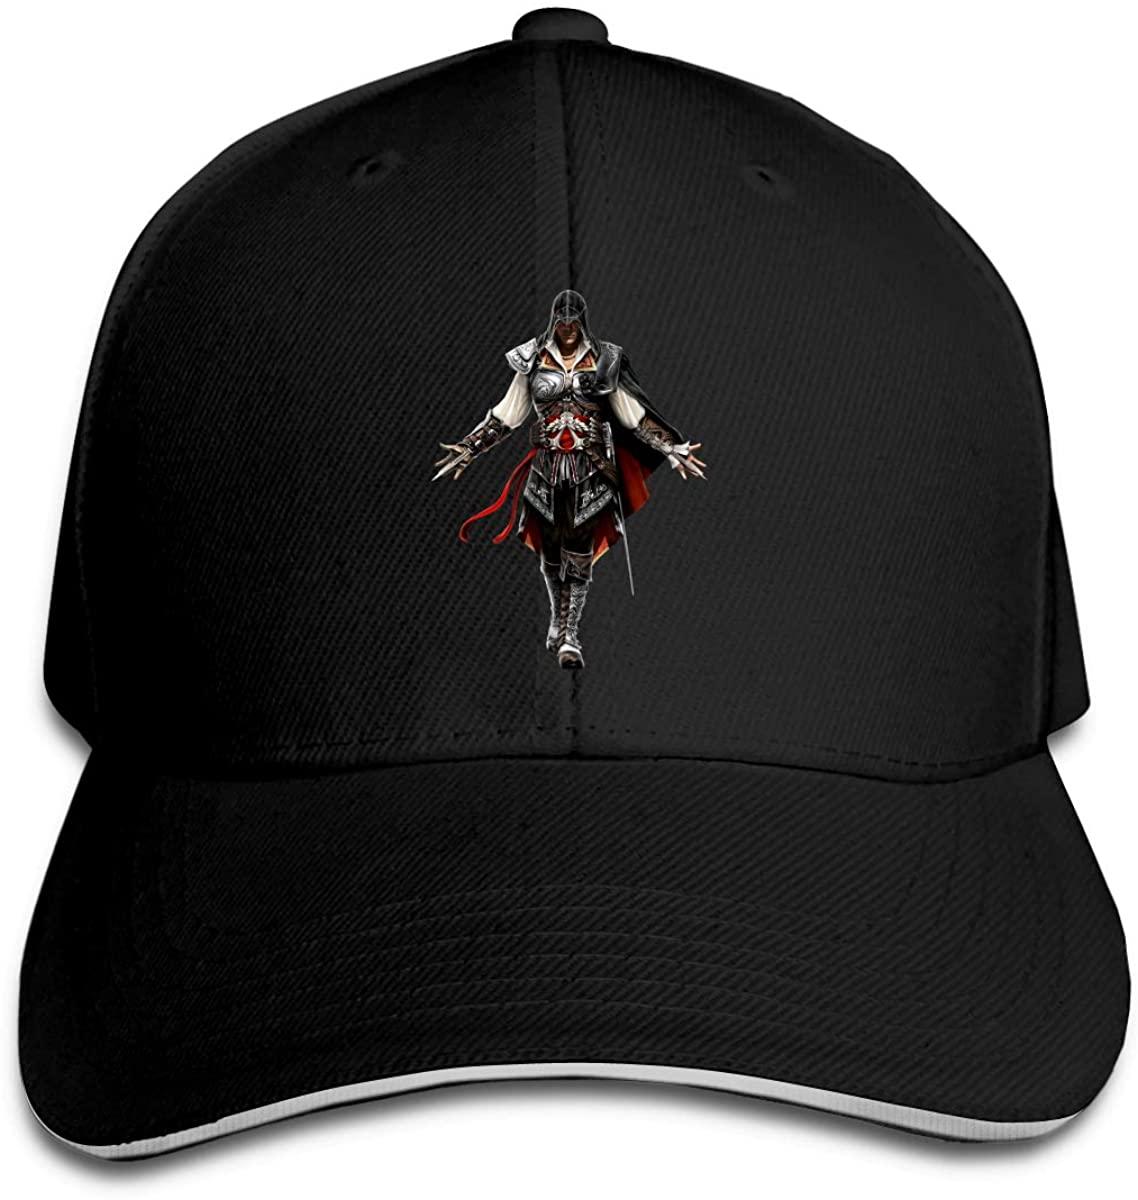 Assassins Creed Ezio 2 Men Womens Baseball Cap Washed Cotton Adjustable Hat